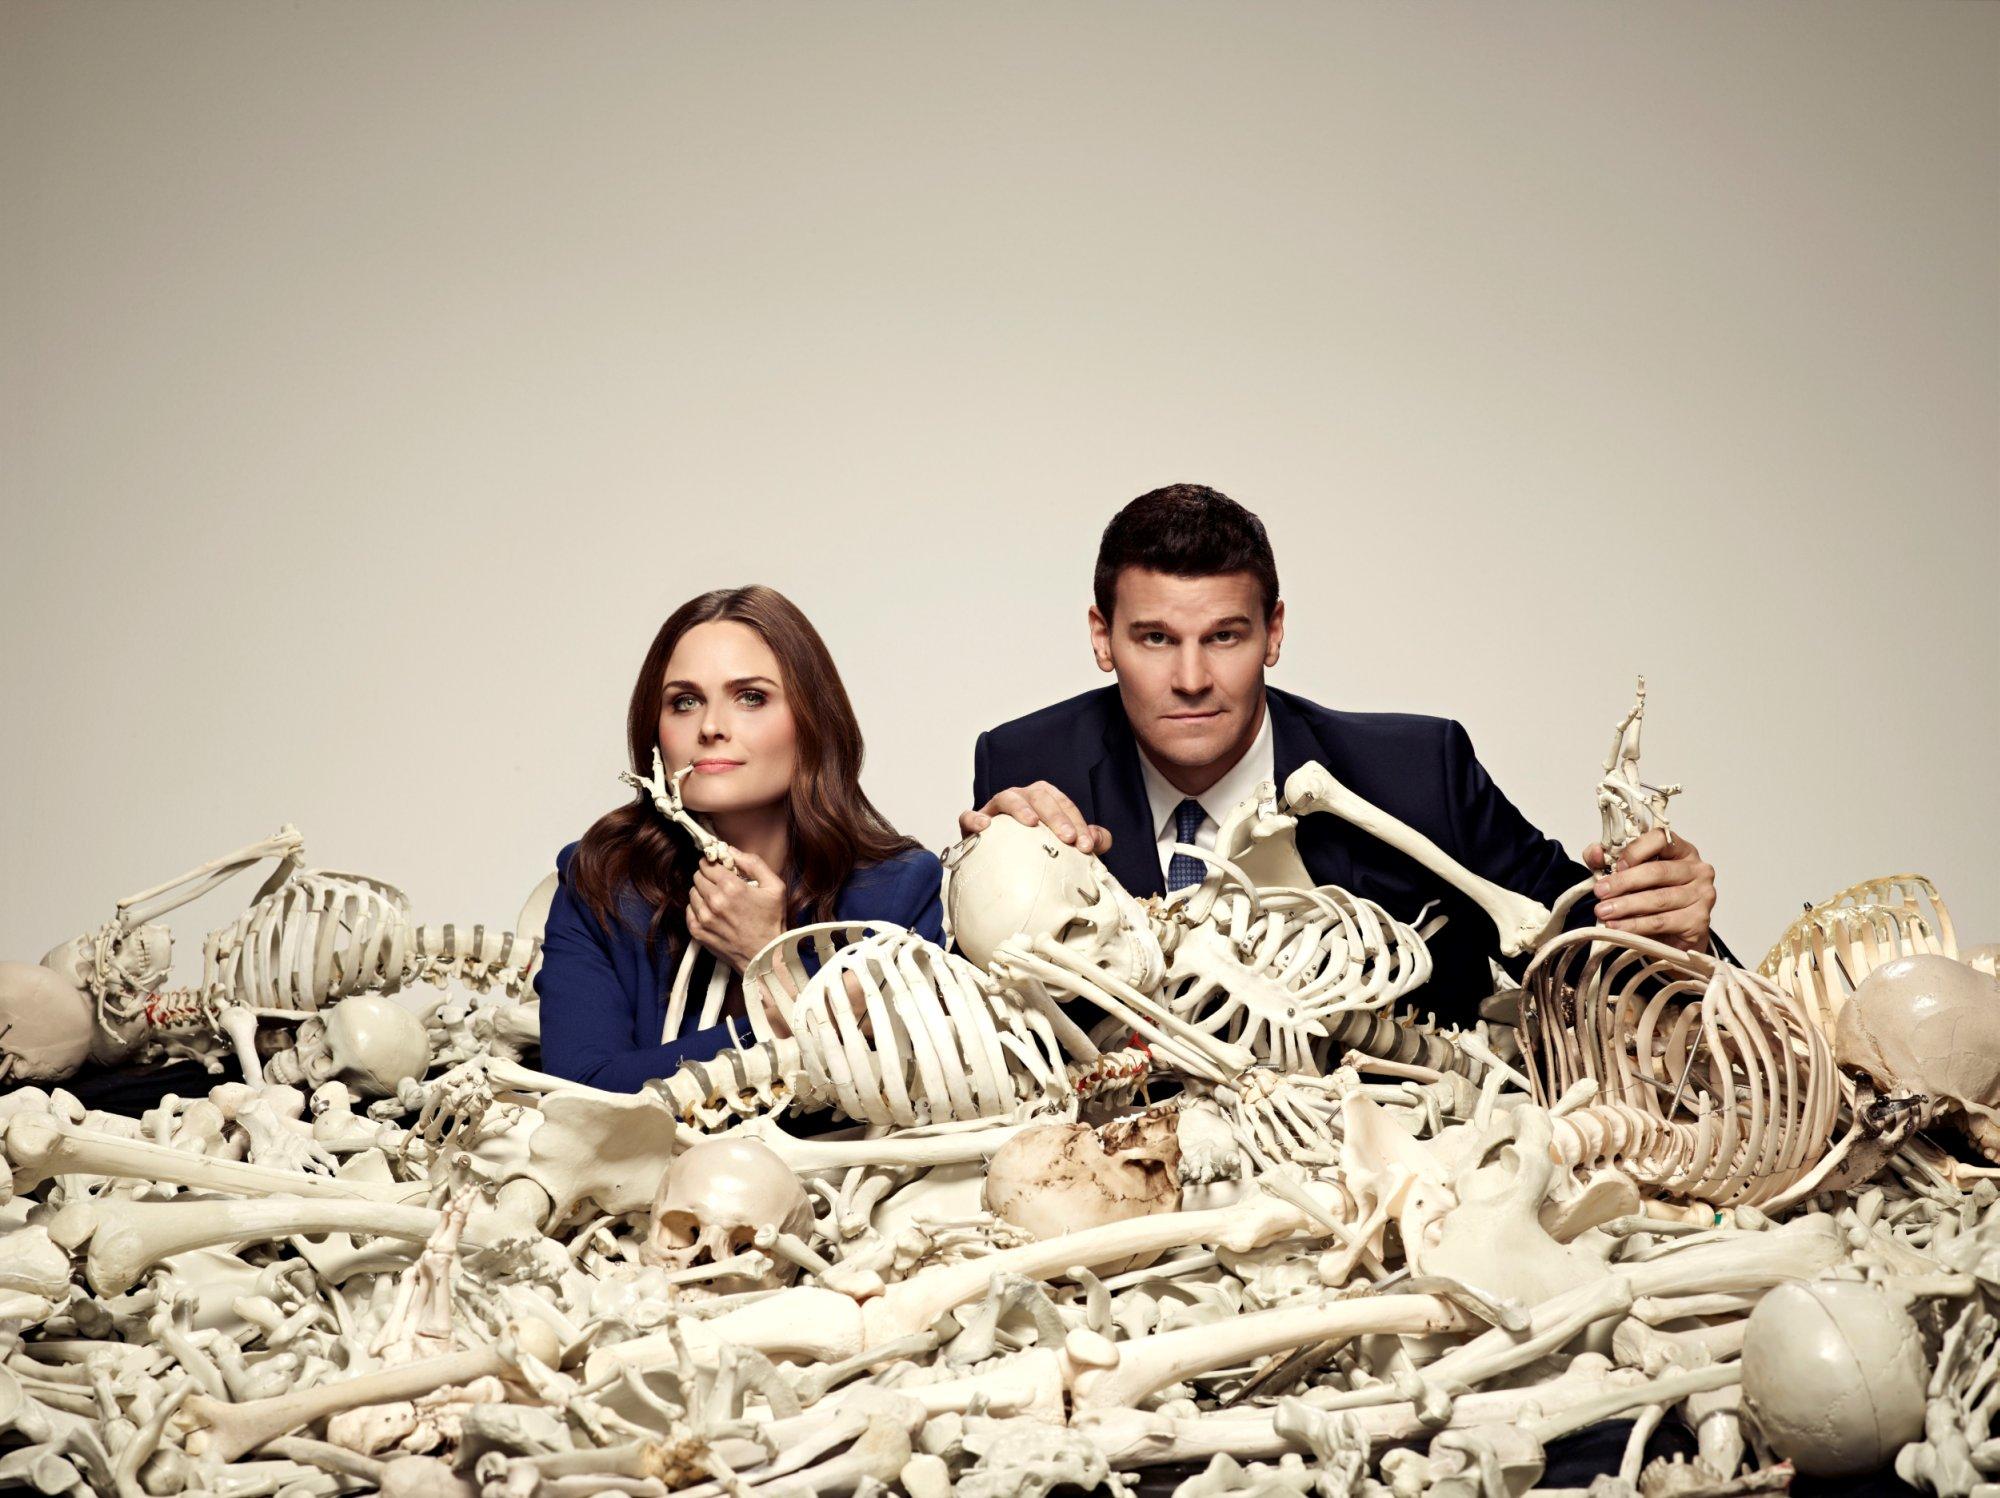 Bones 9